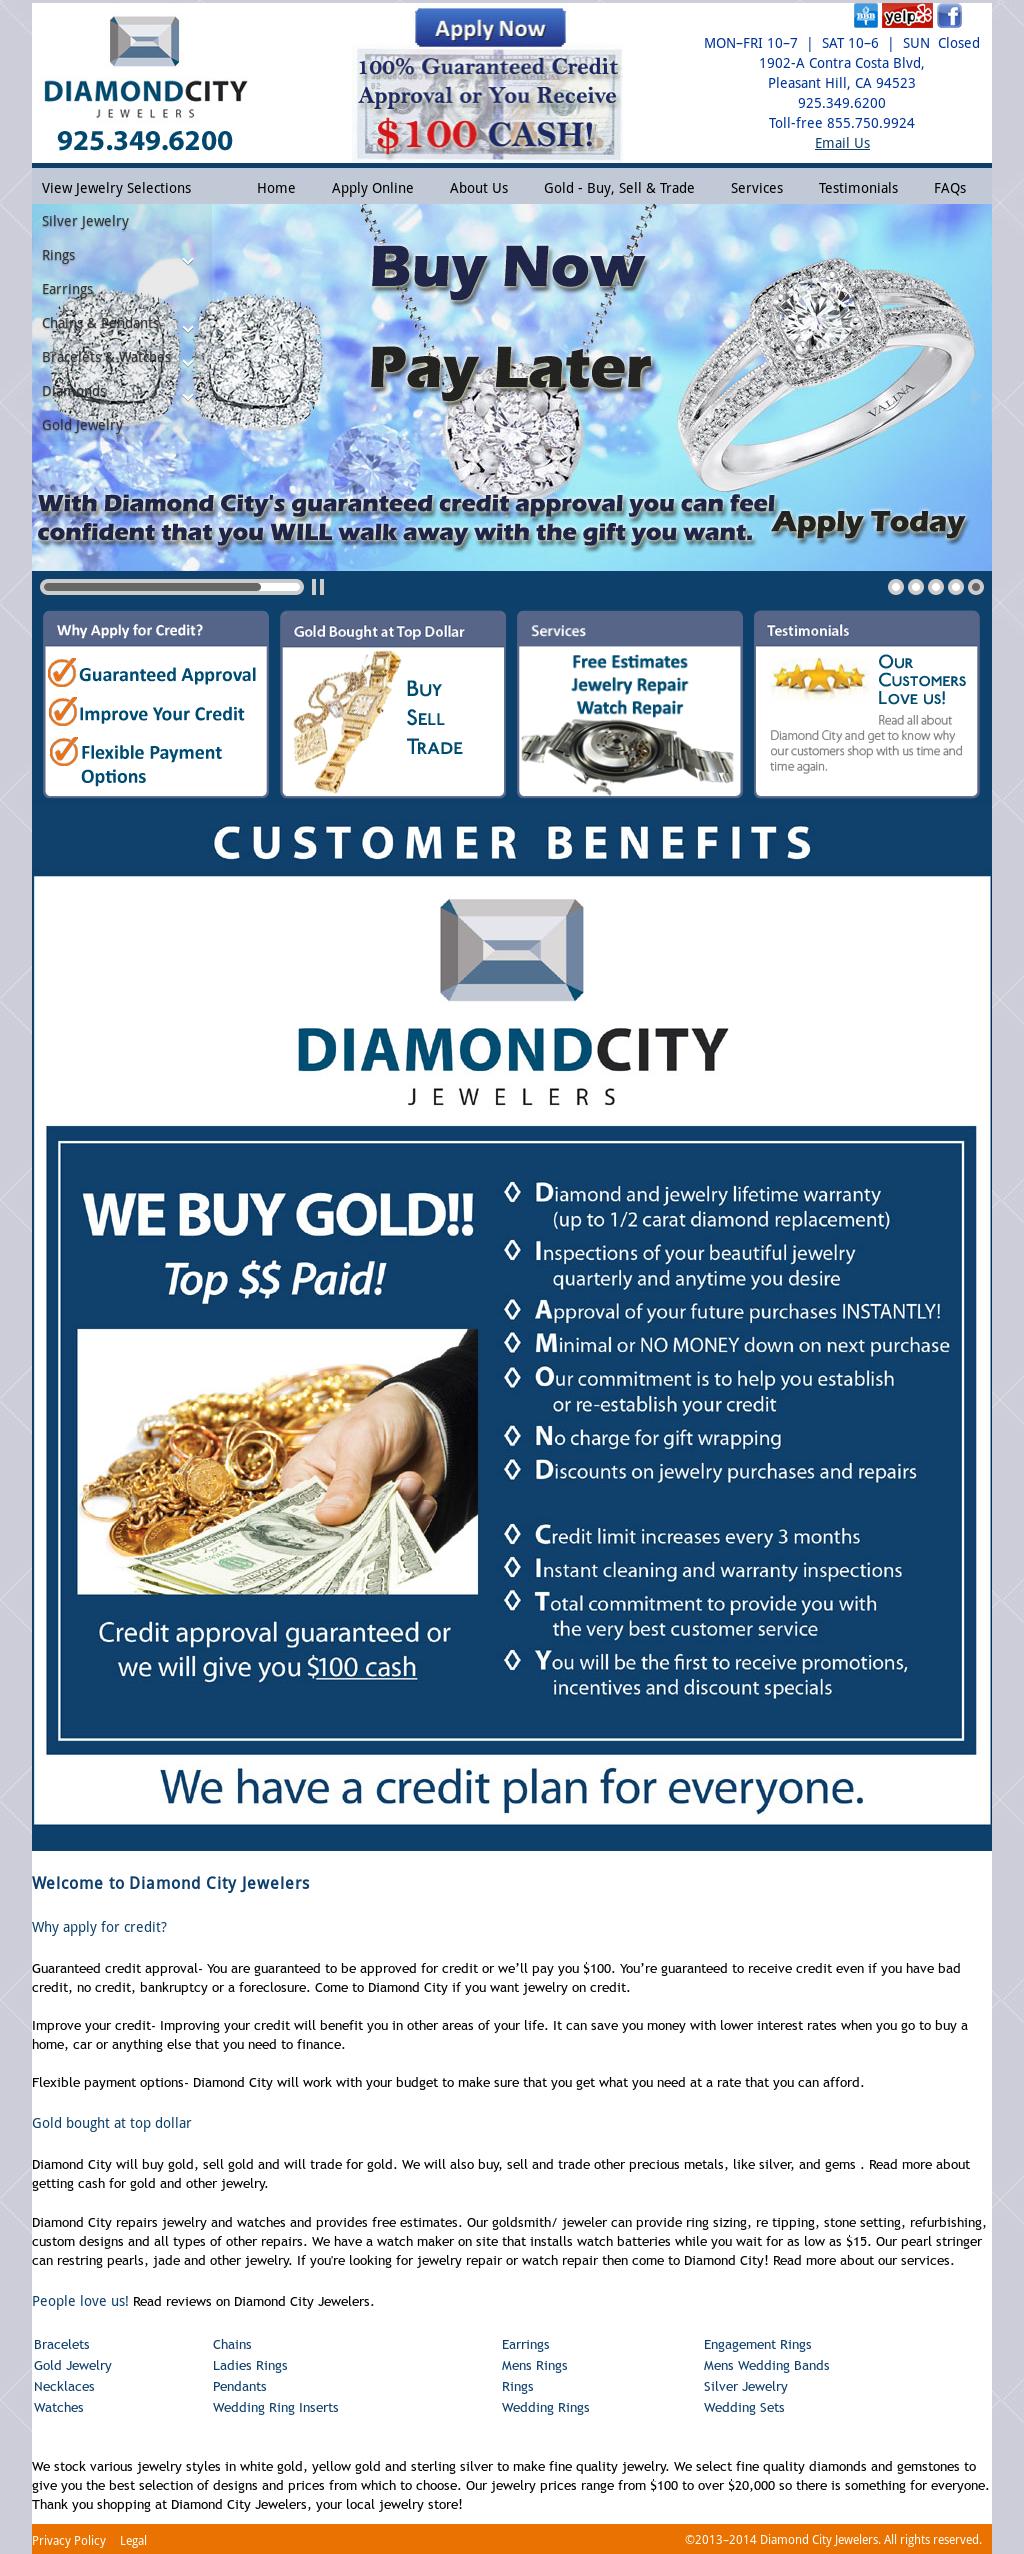 Diamond City Jewelers Competitors, Revenue and Employees